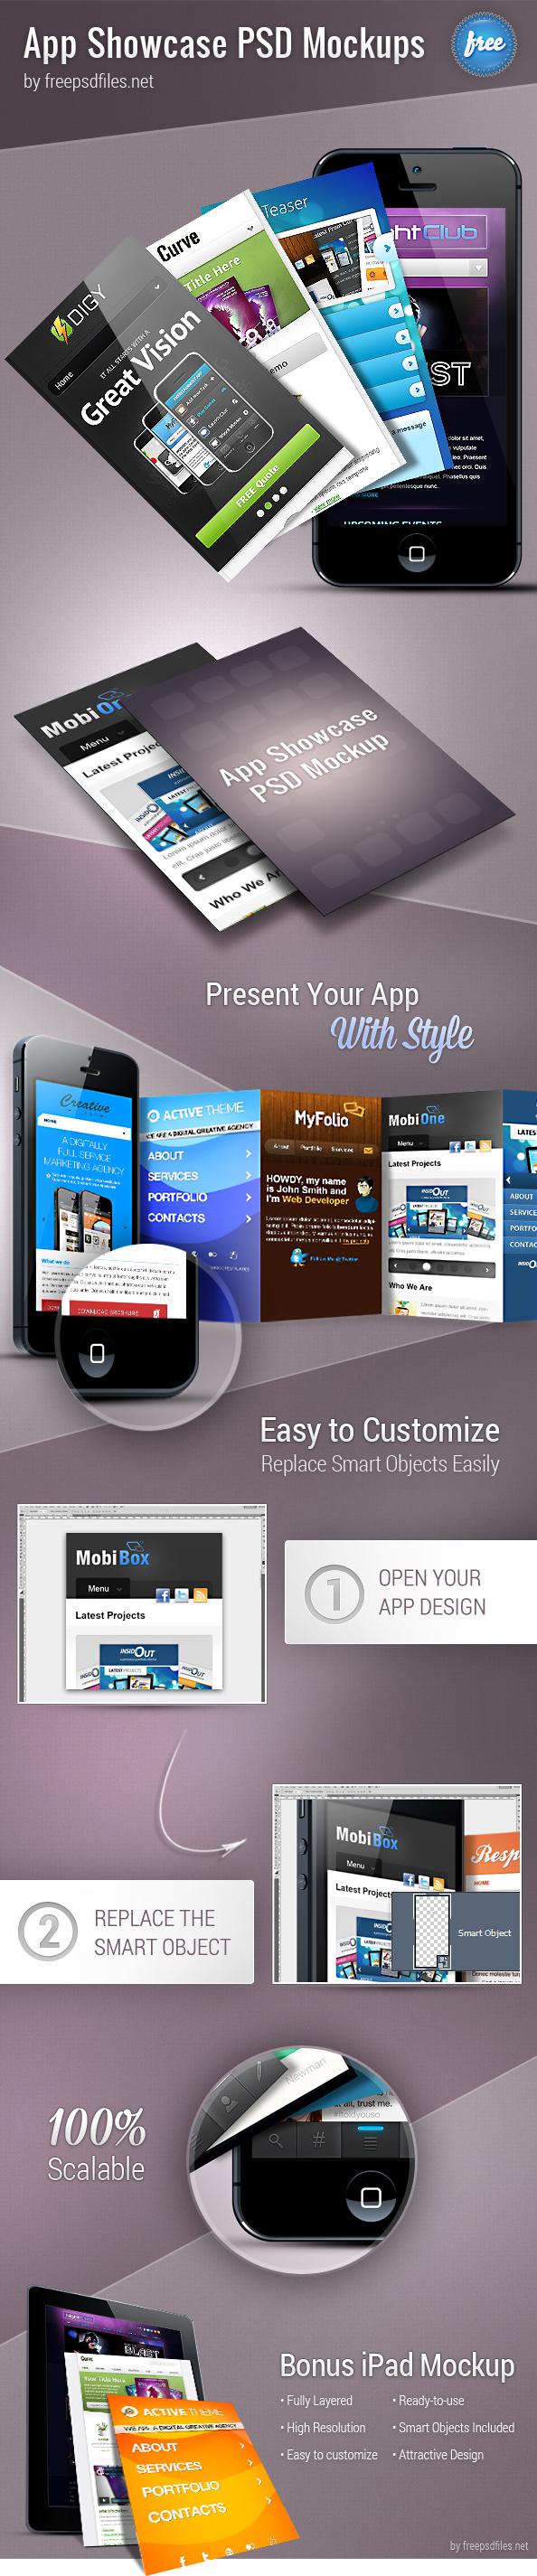 Free App Showcase PSD Mockups